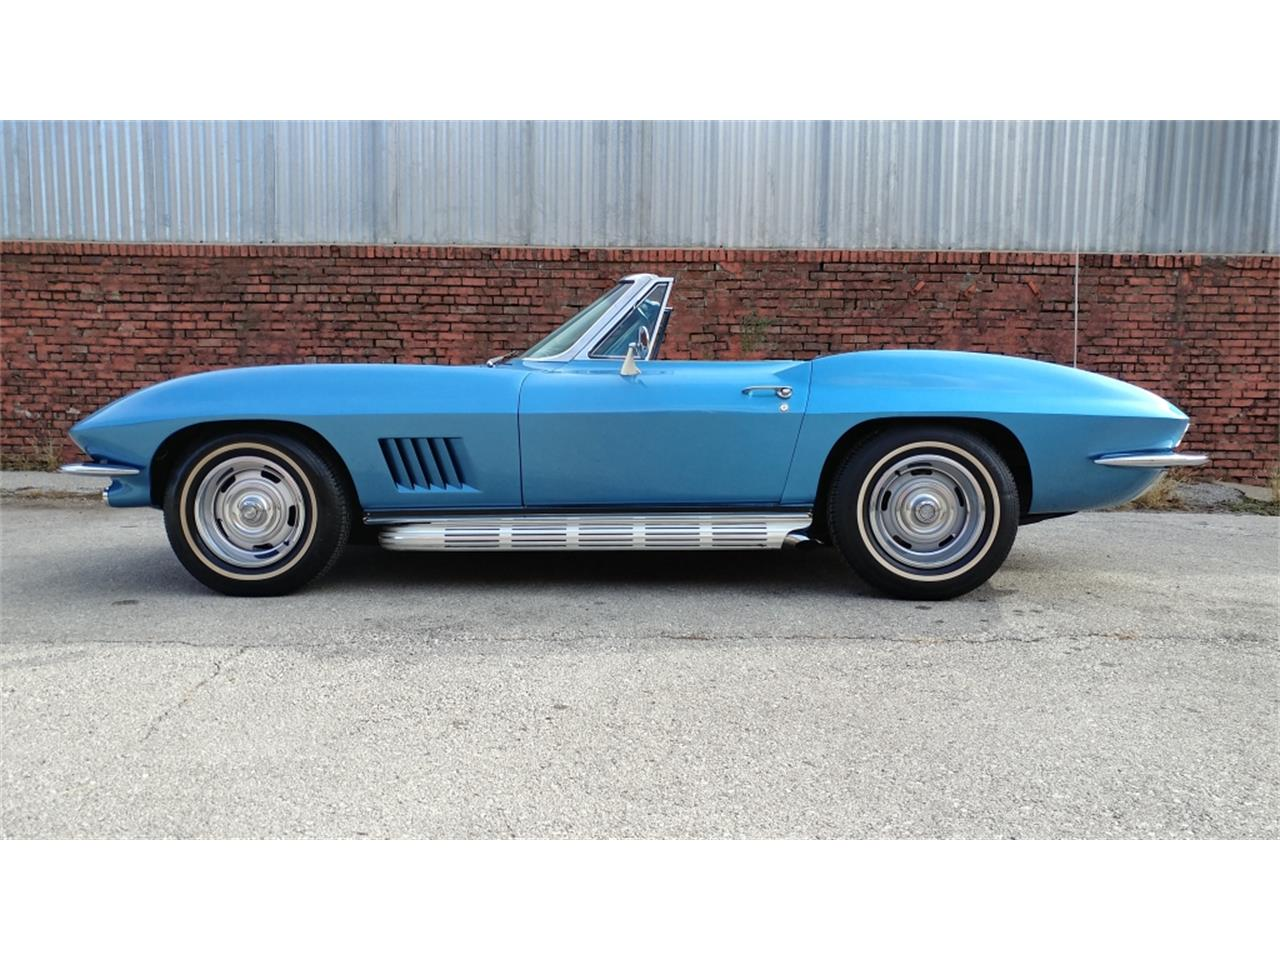 Large Picture of Classic '67 Corvette located in Missouri - $69,500.00 - MO2L